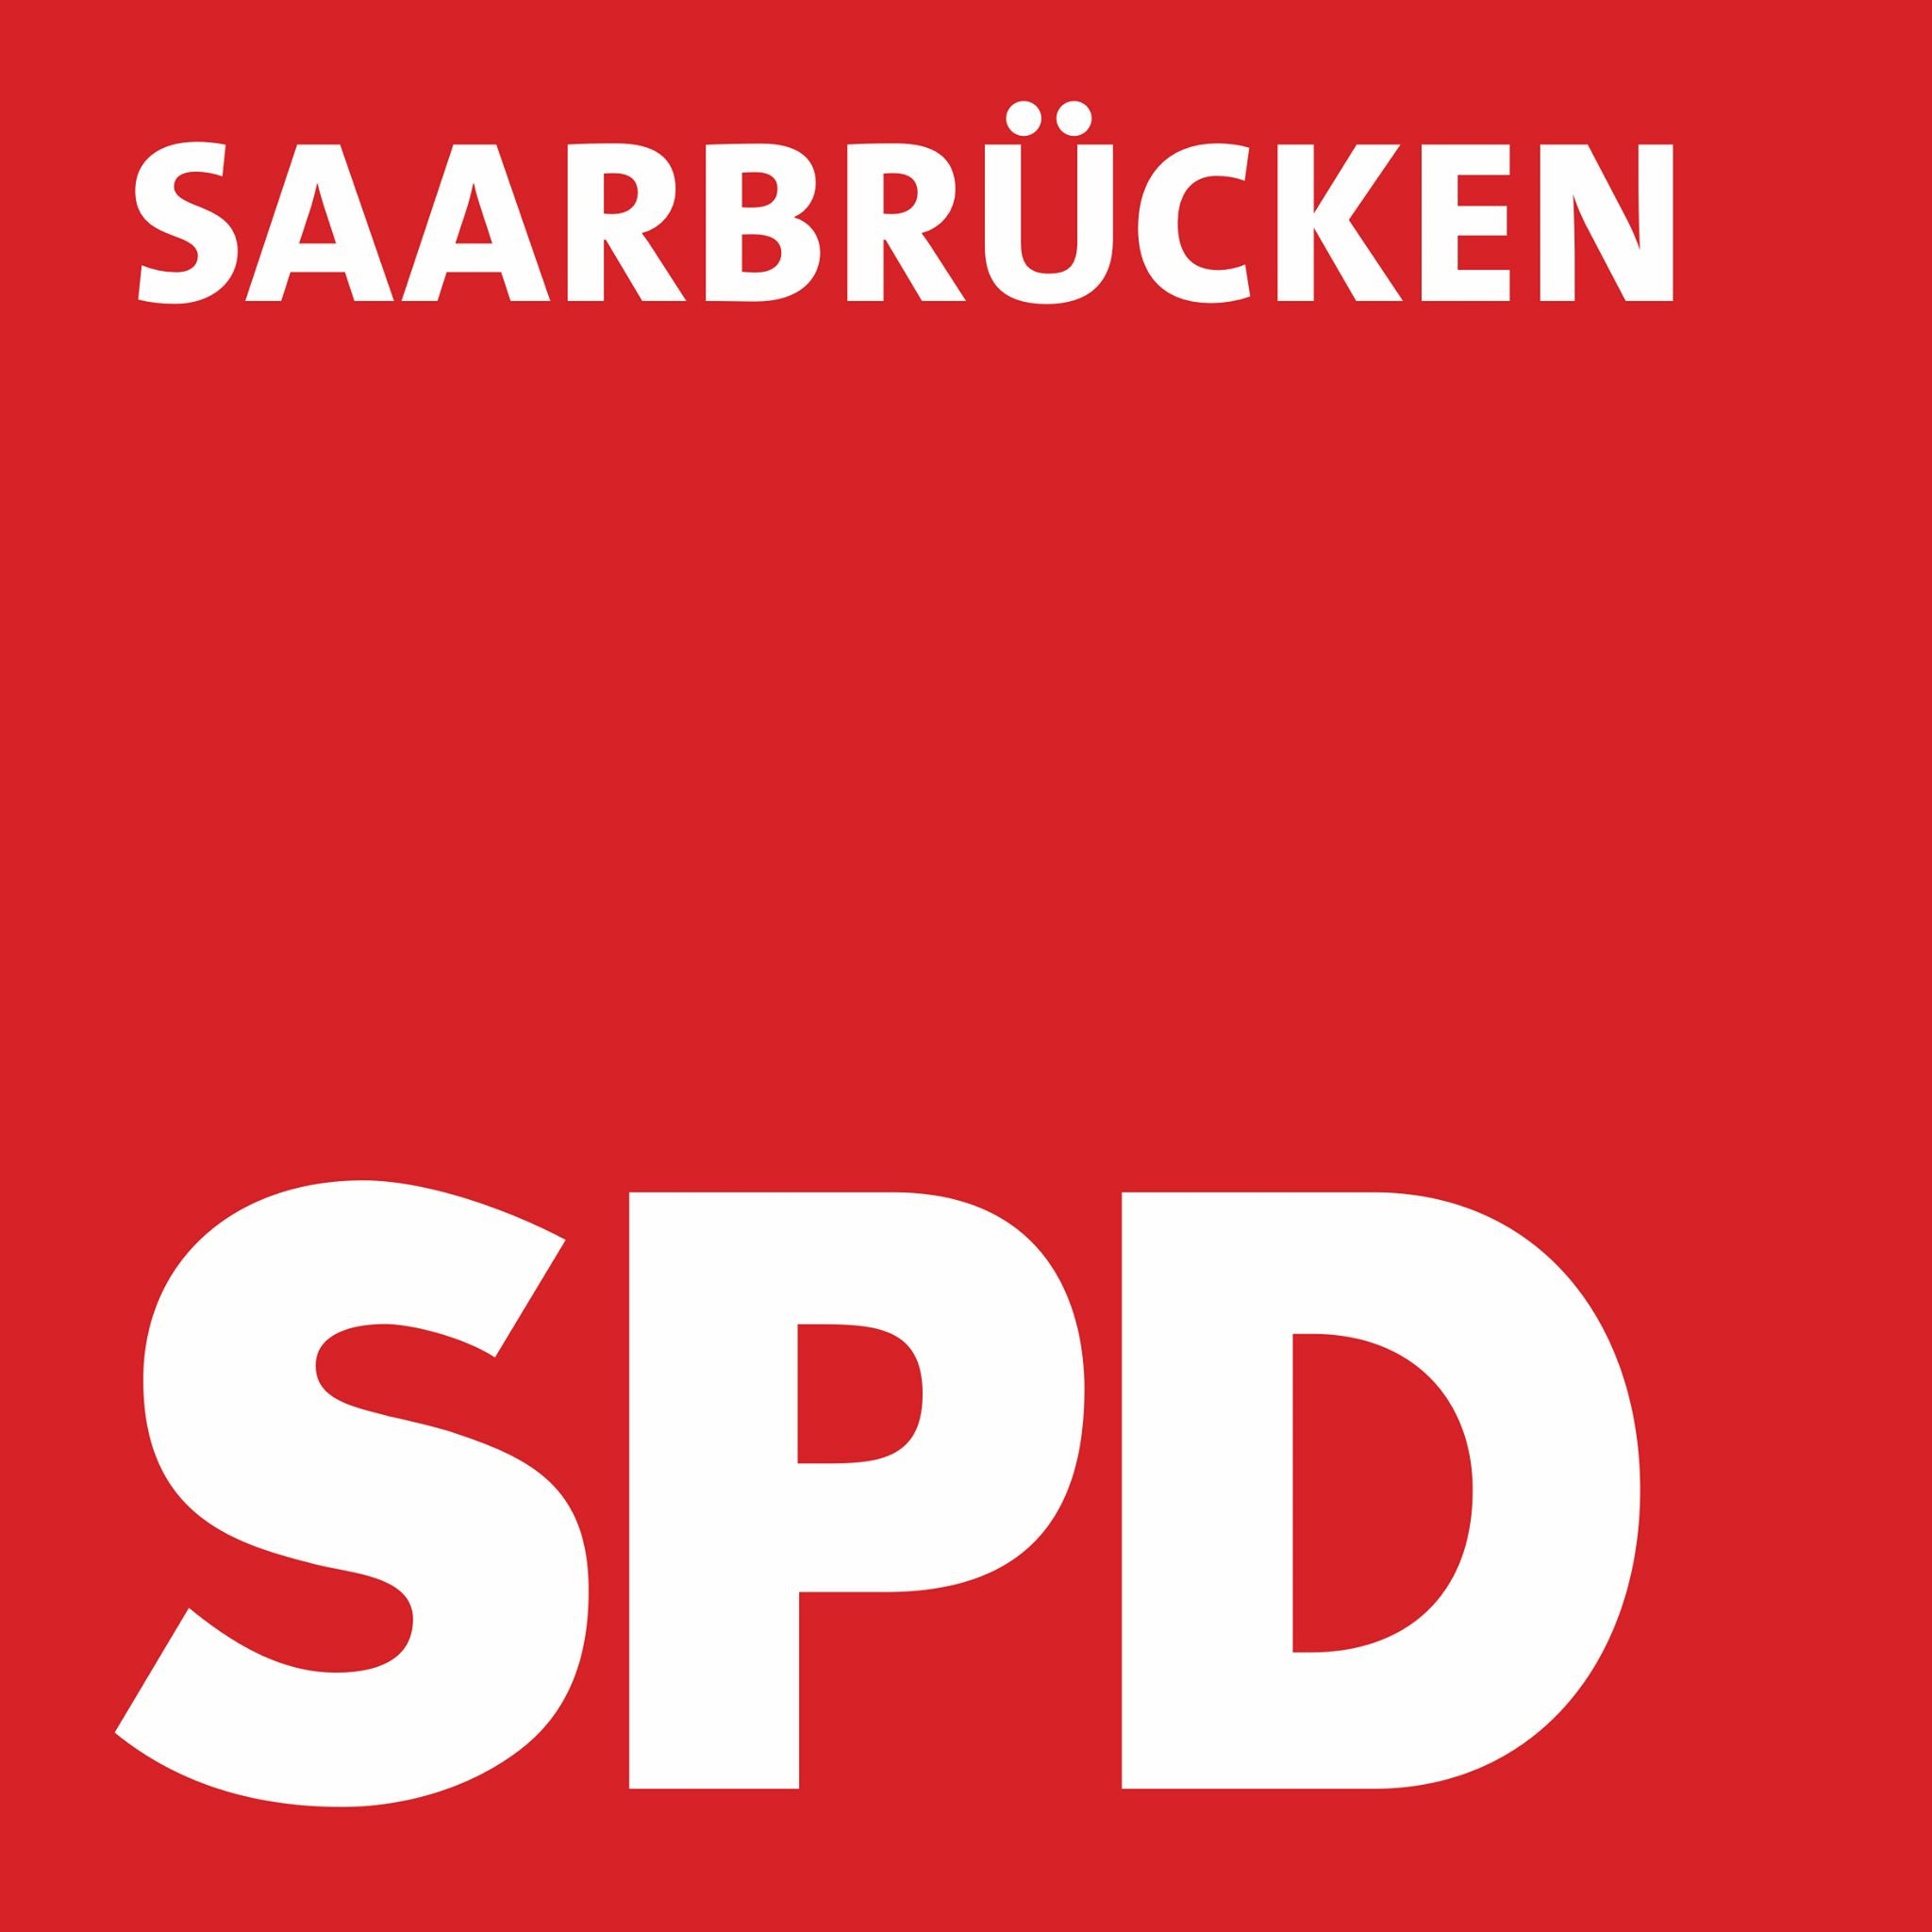 SPD Saarbrücken